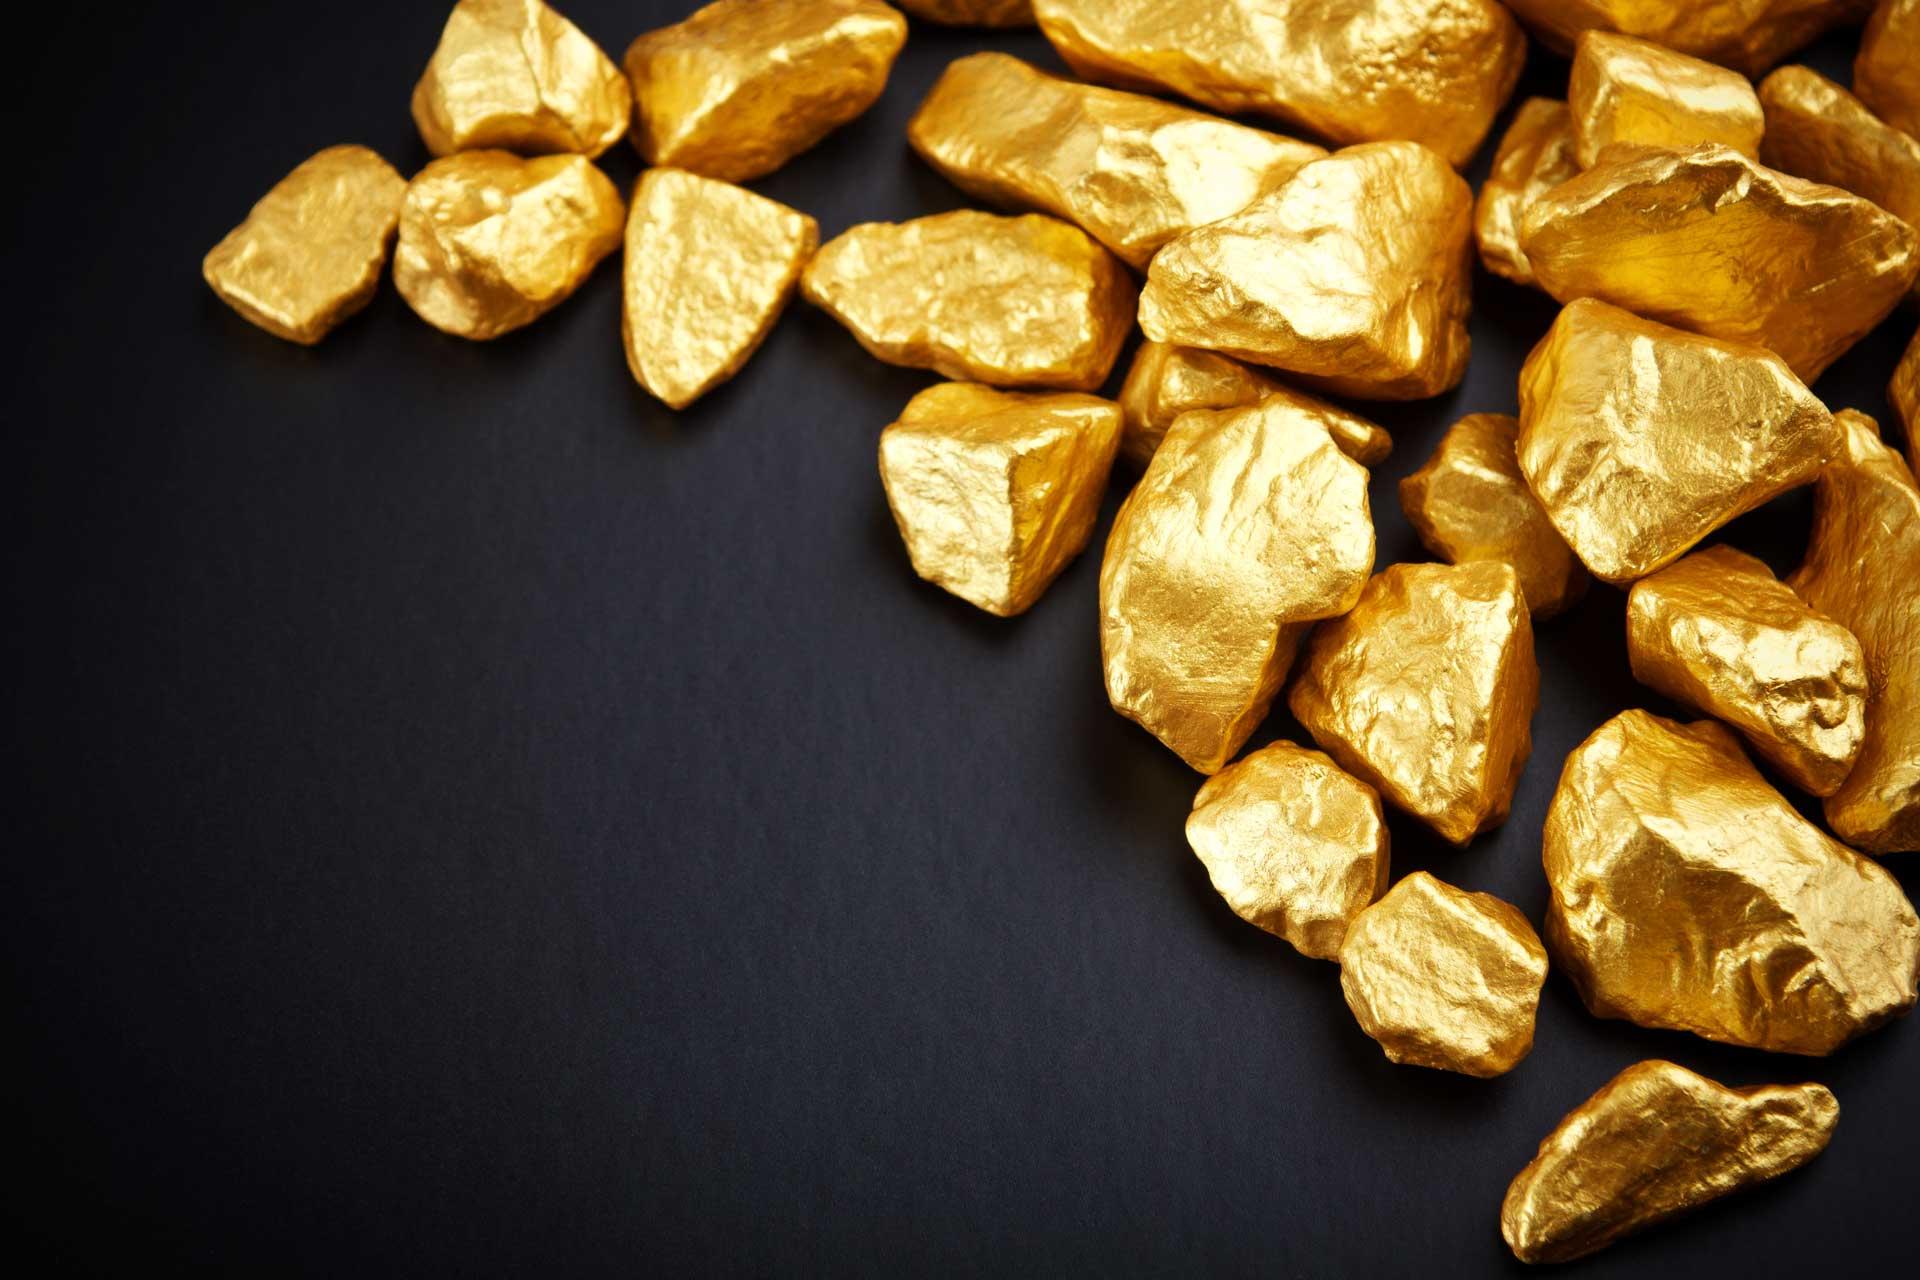 Gold Backgrounds, Compatible - PC, Mobile, Gadgets  1920x1280 px